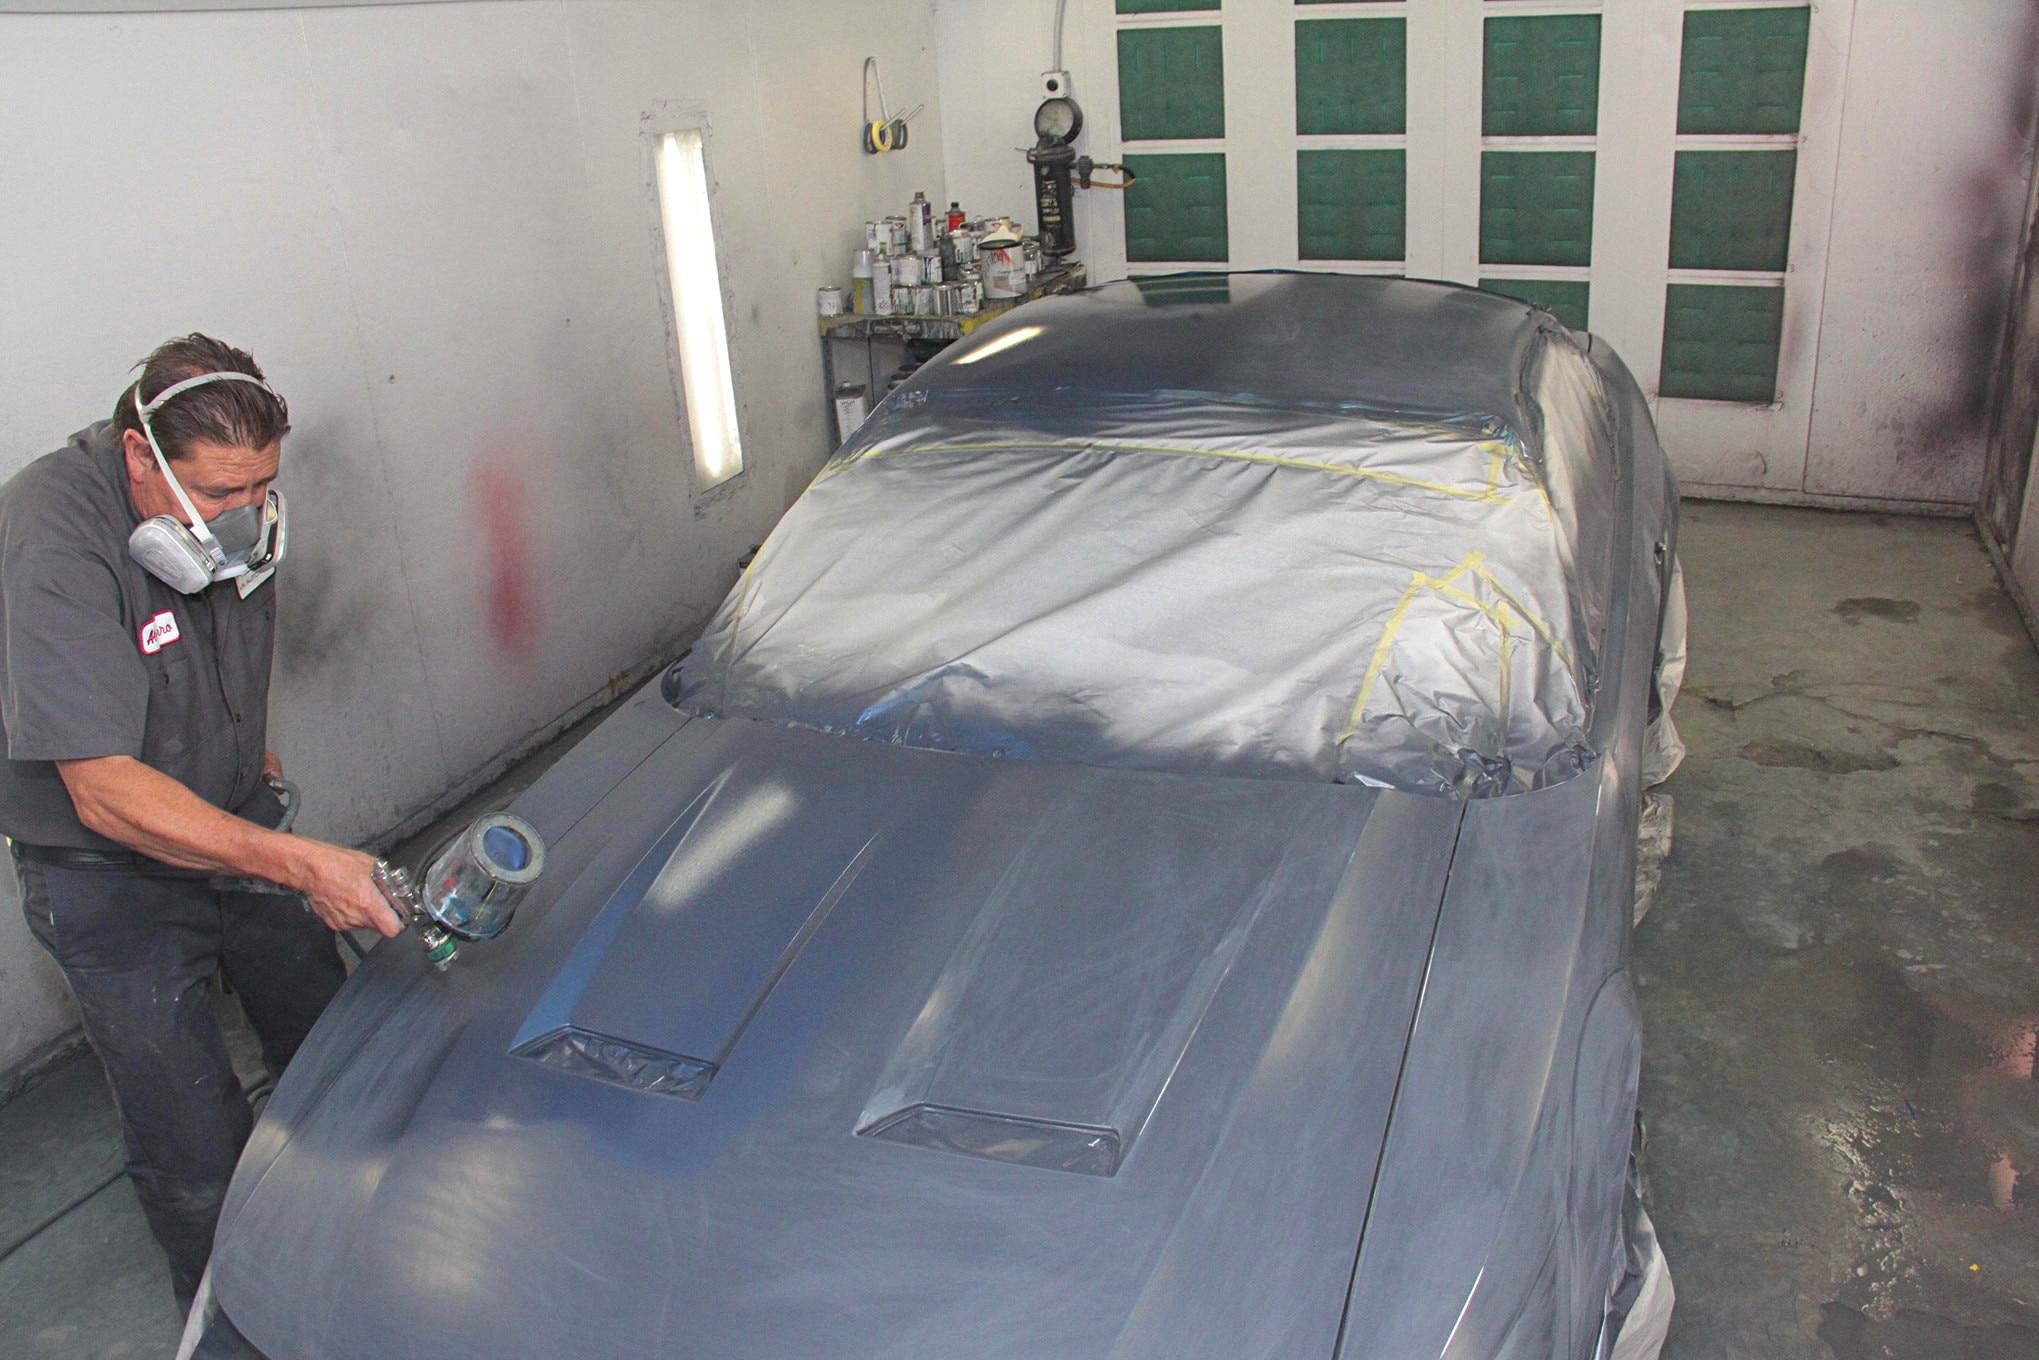 009 1999 Mustang Gt Paint Preparation Axalta Fitment